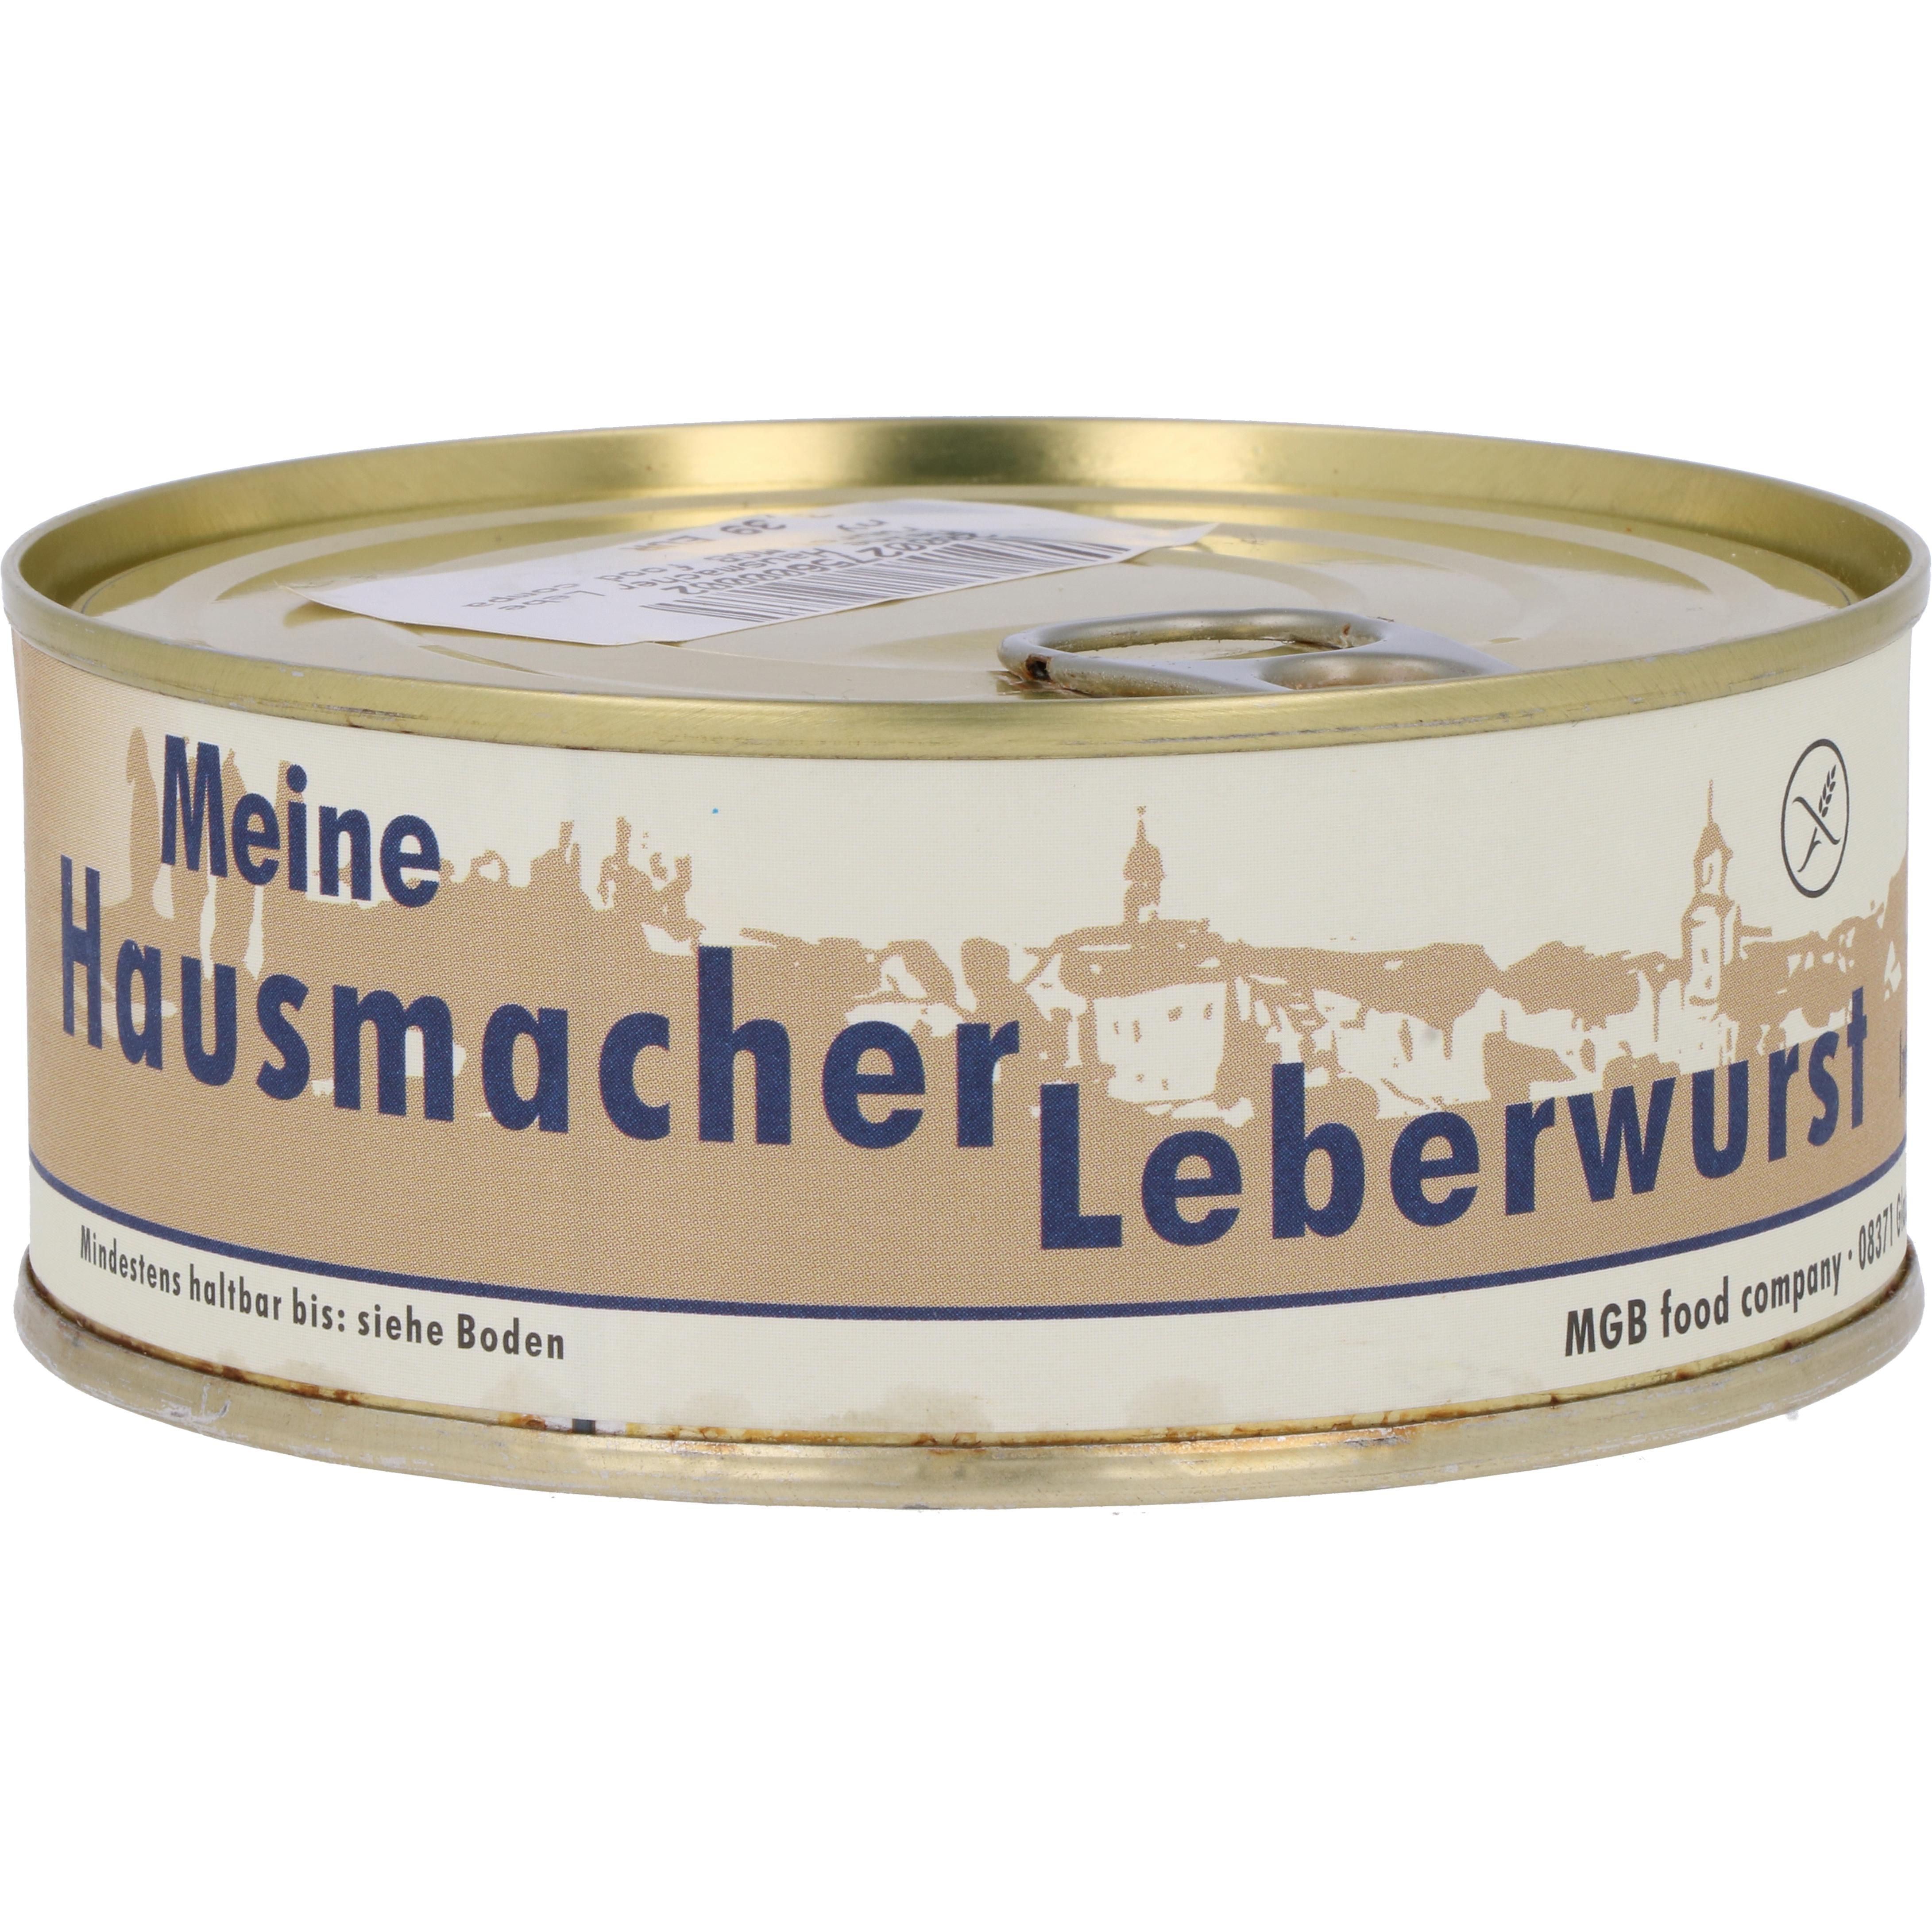 MGB food company Meine Hausmacher Leberwurst 220g